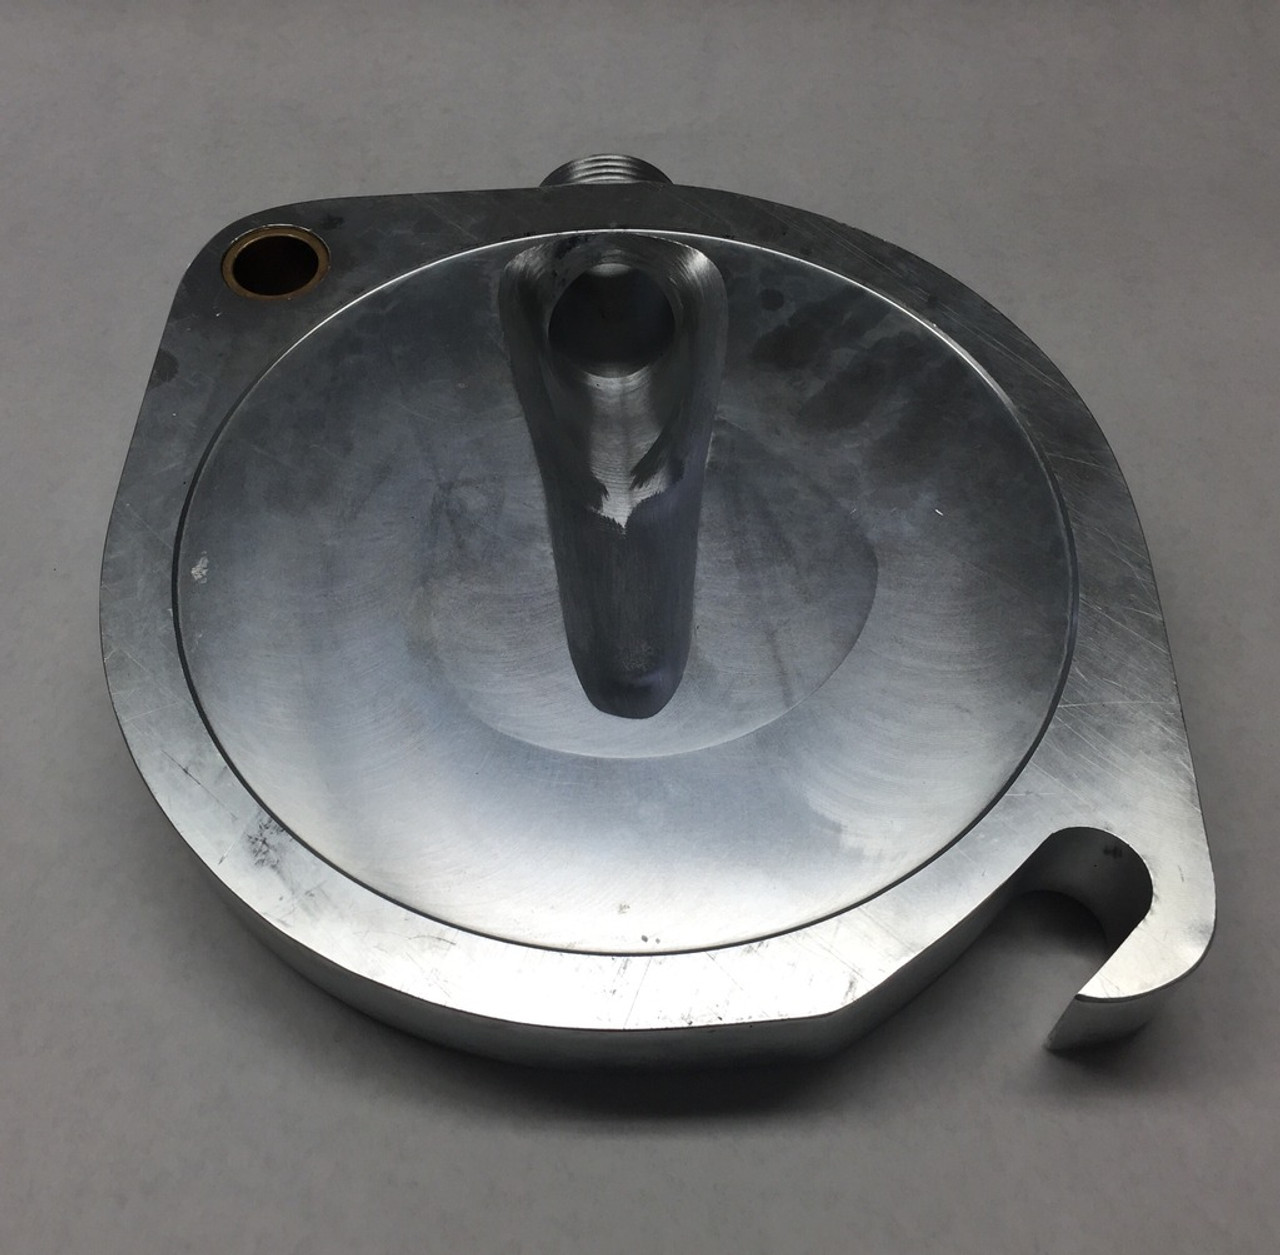 Talsa H-200 - H26 Series - Aluminium Lid w/Horseshoe & w/Out Accesories - 7005